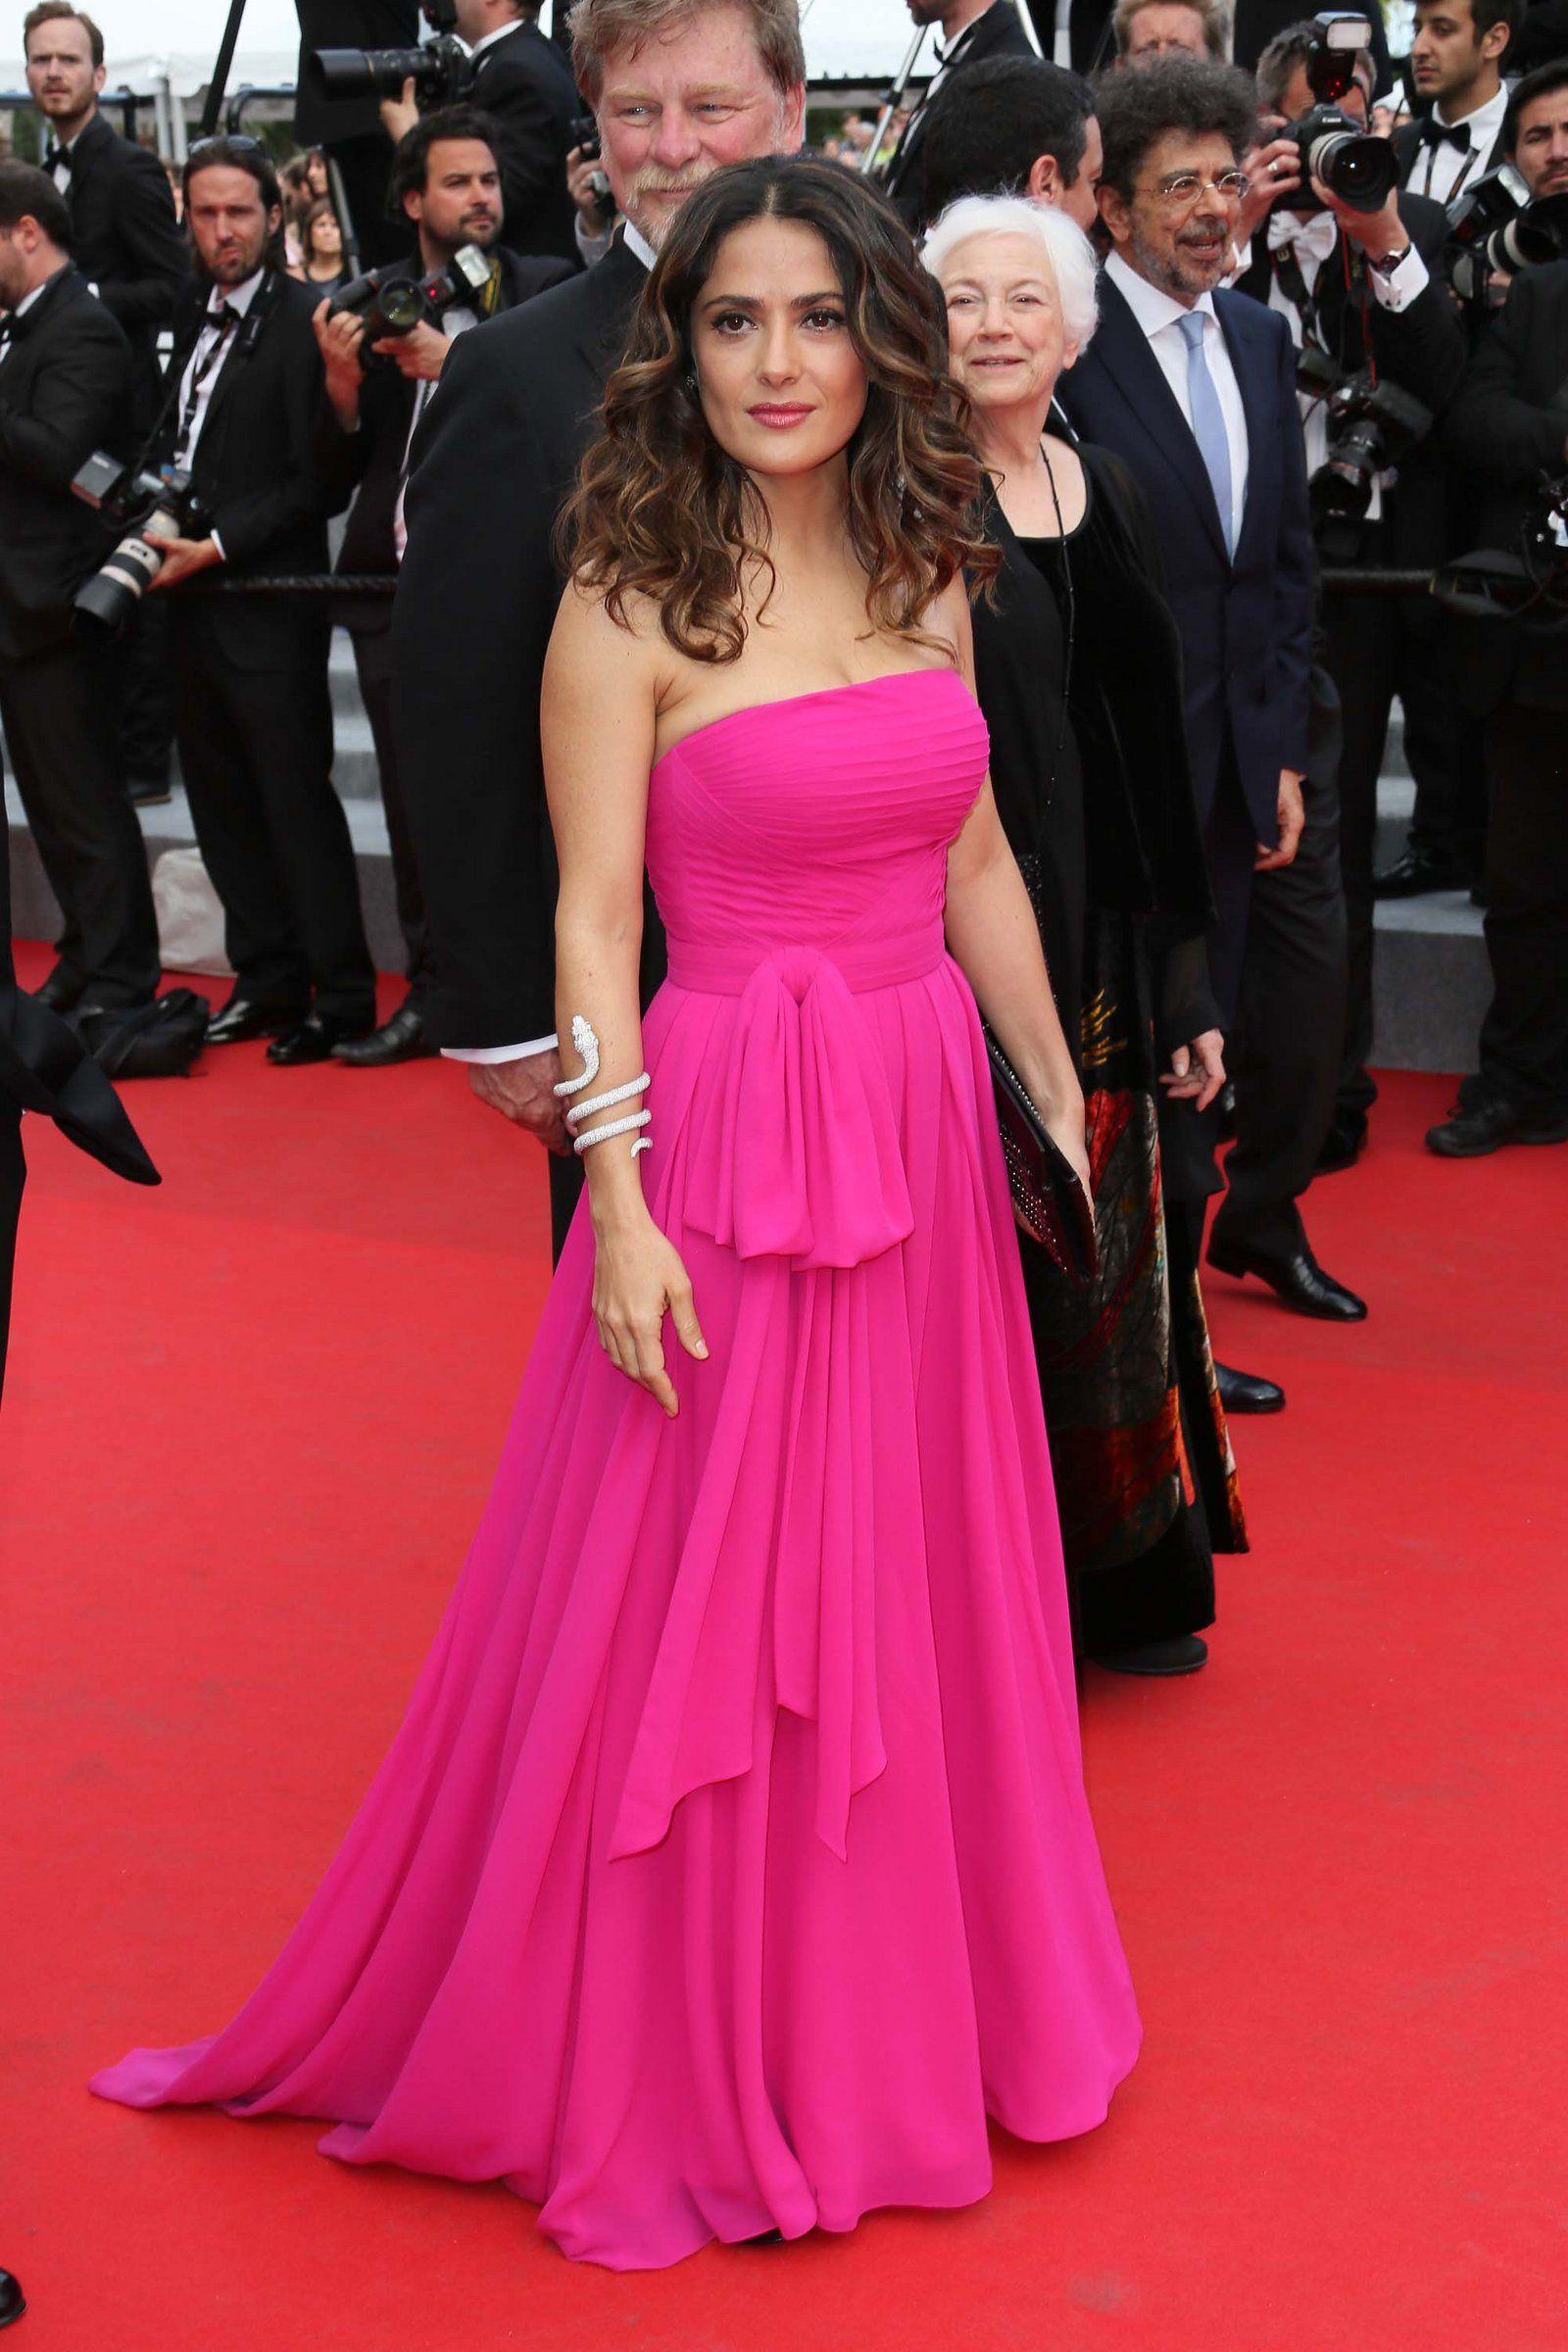 At 50, Salma Hayek Has Age-Defying Bombshell Style | Salma hayek ...